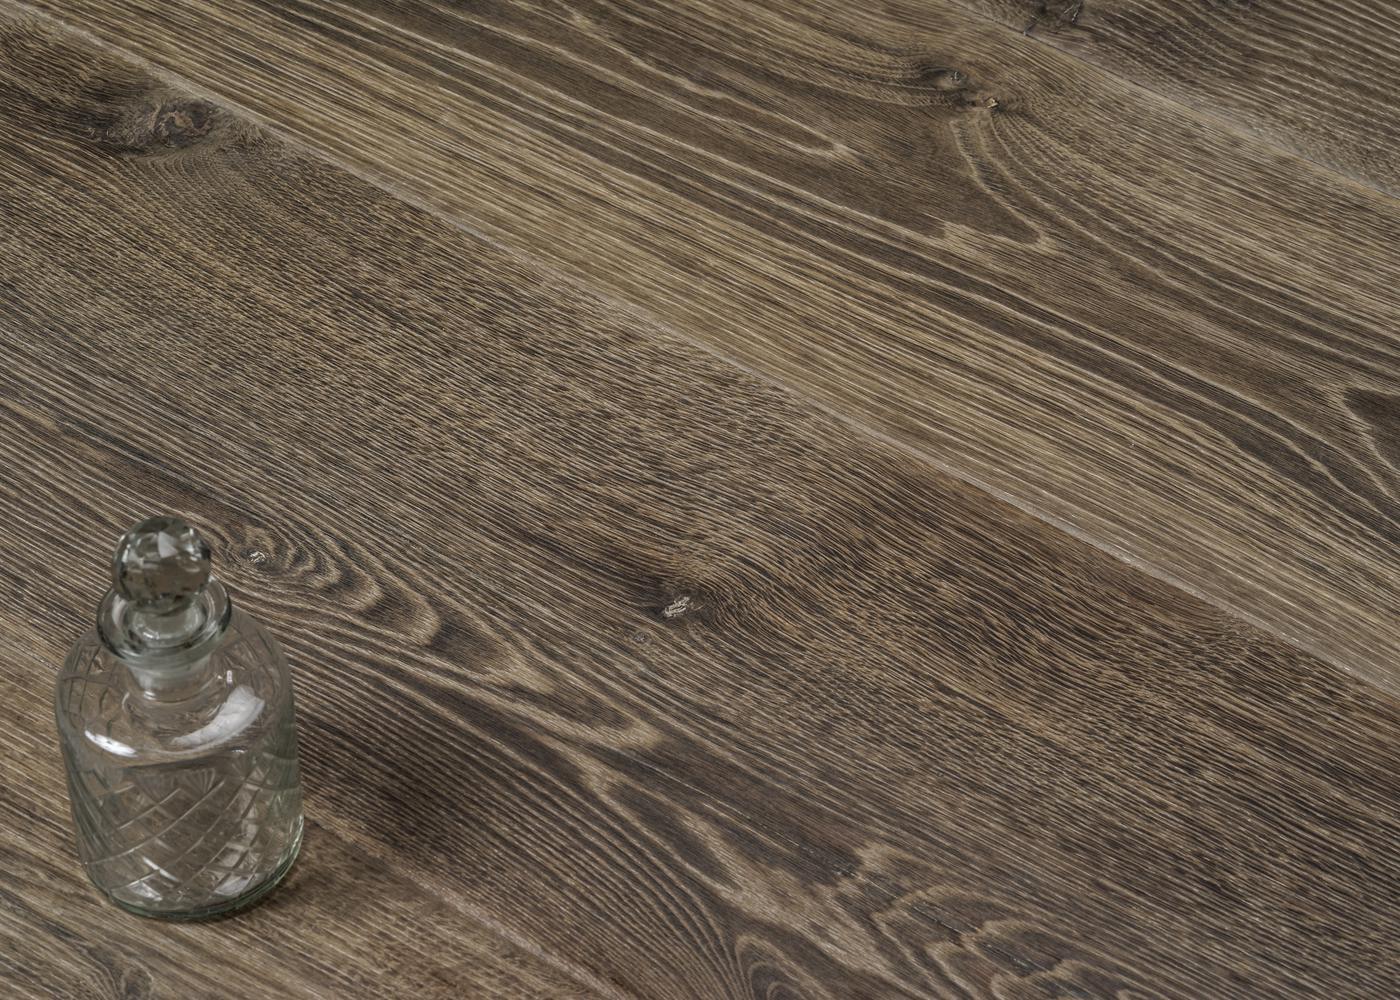 Parquet chêne contrecollé CANARIES usé brossé huile aqua 20-22x140/180/220x1800-2700